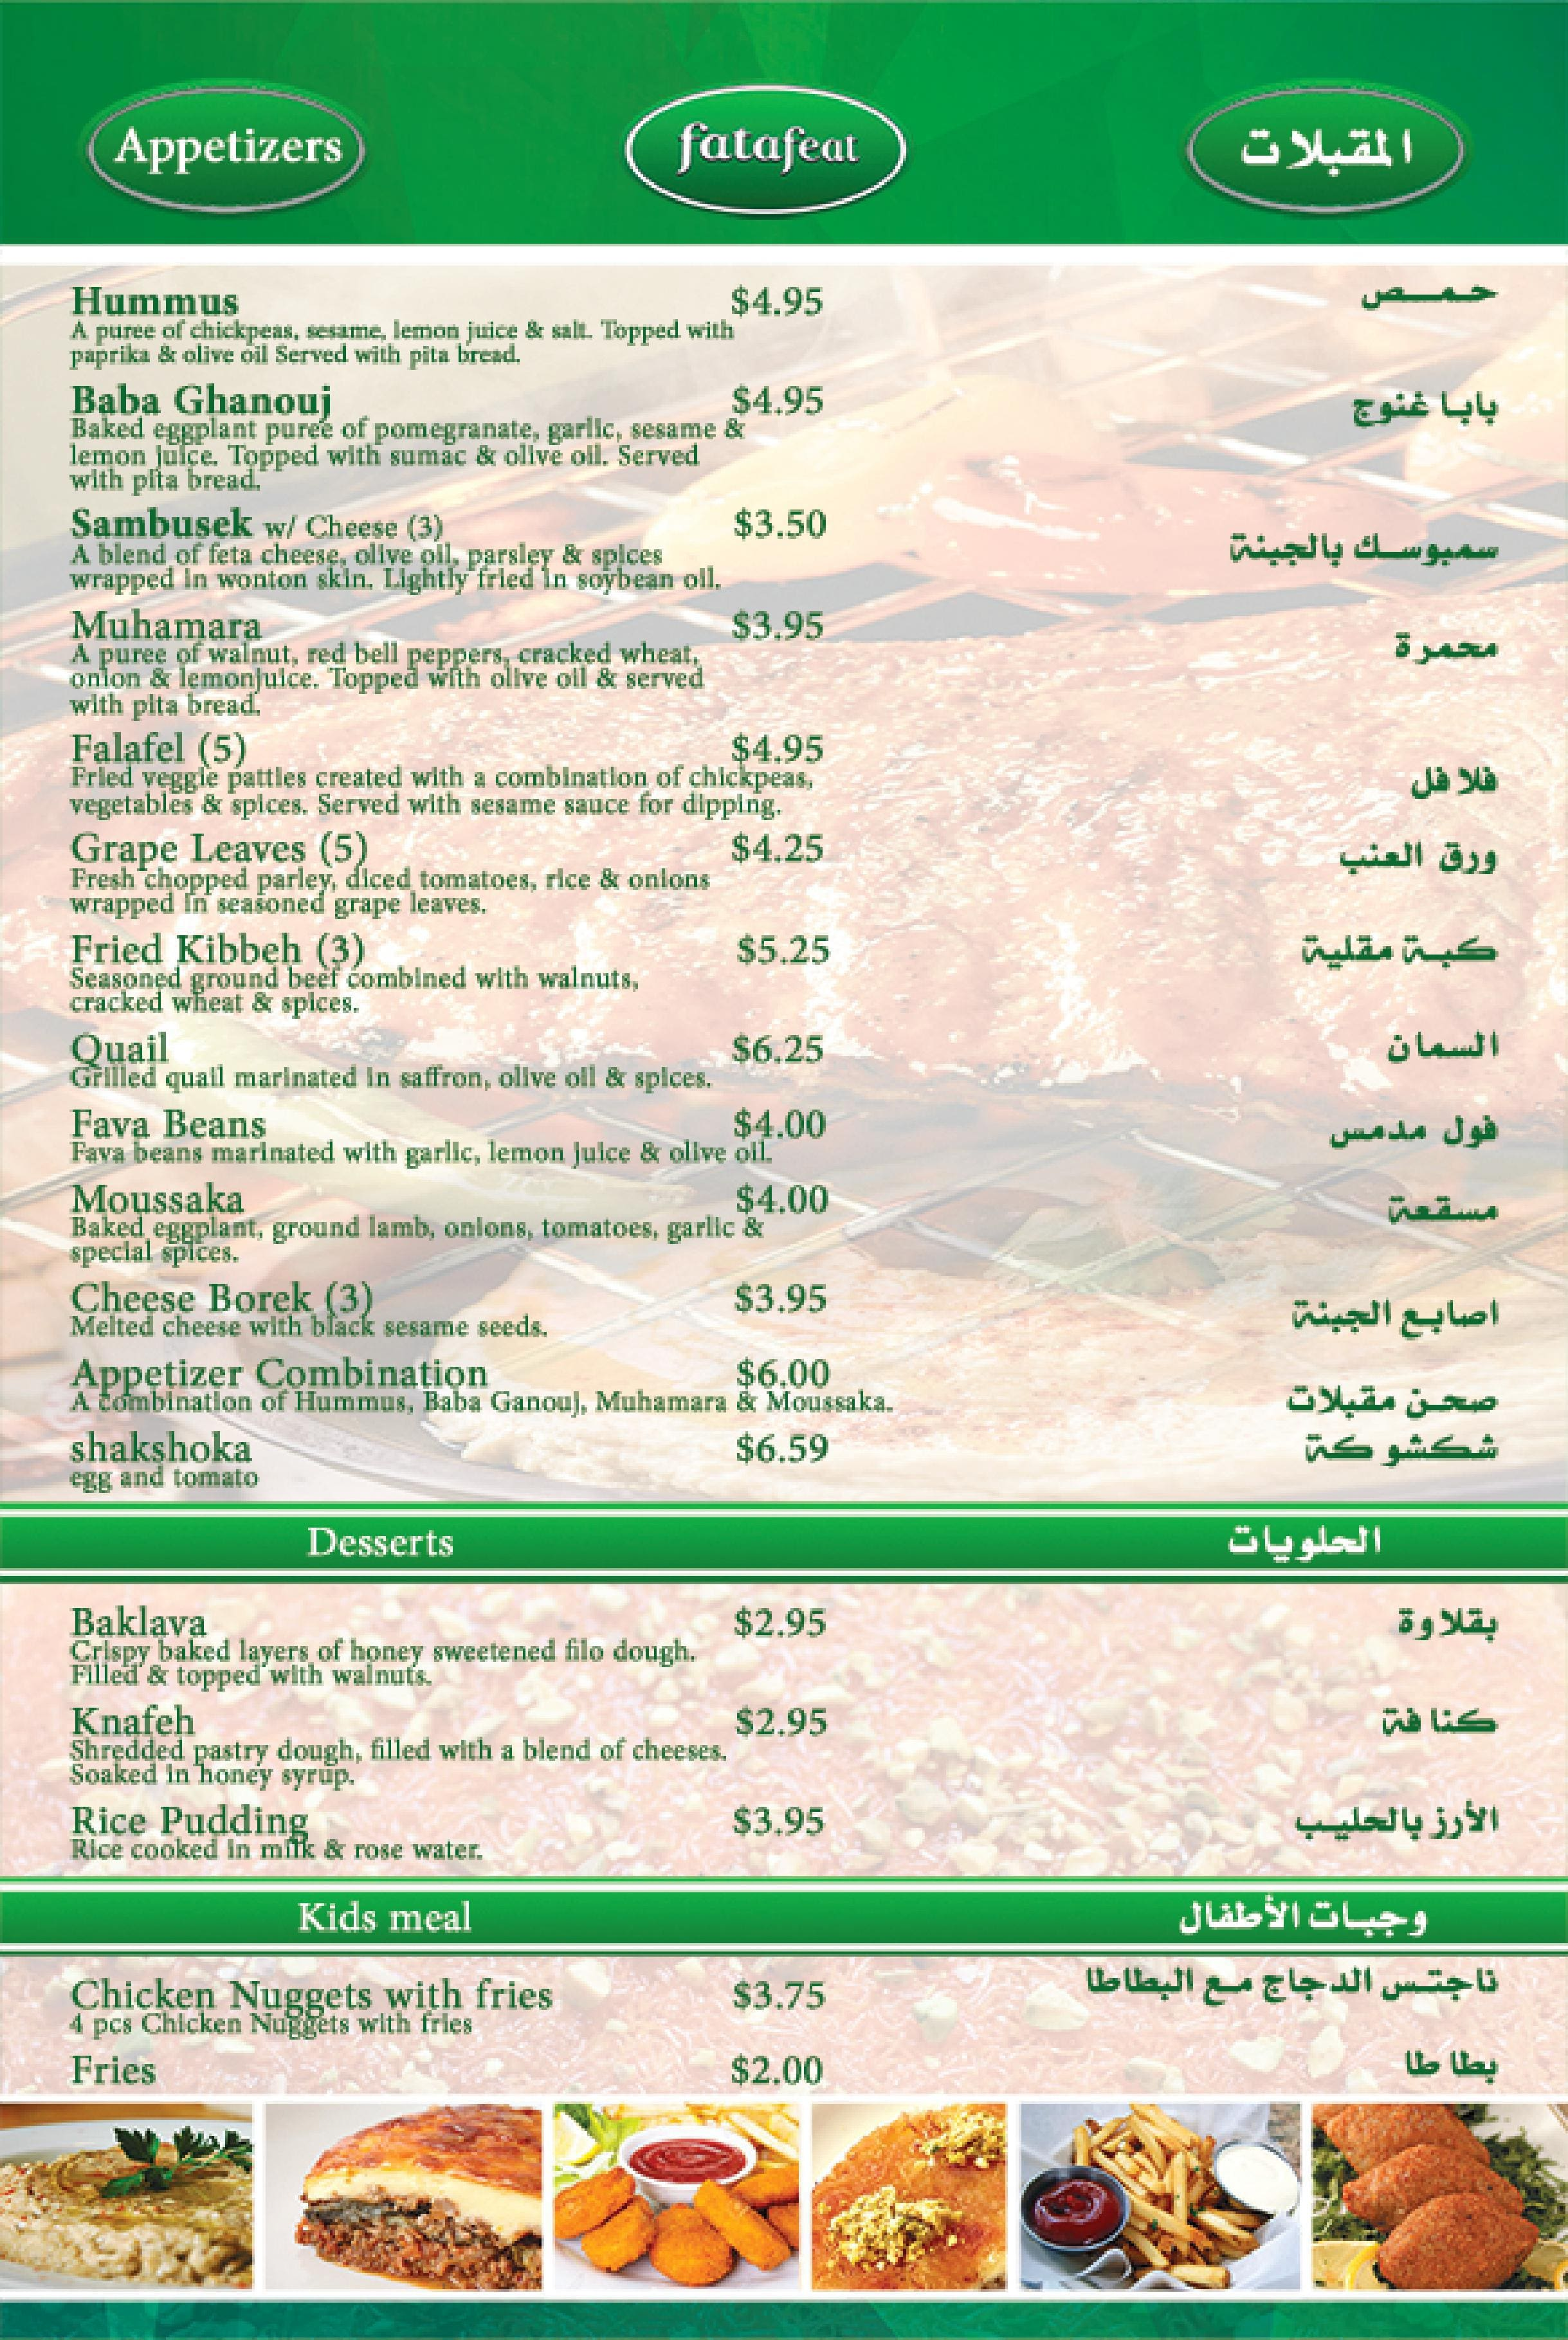 Fatafeat mediterranean cuisine menu urbanspoon zomato for Mediterranean restaurant menu